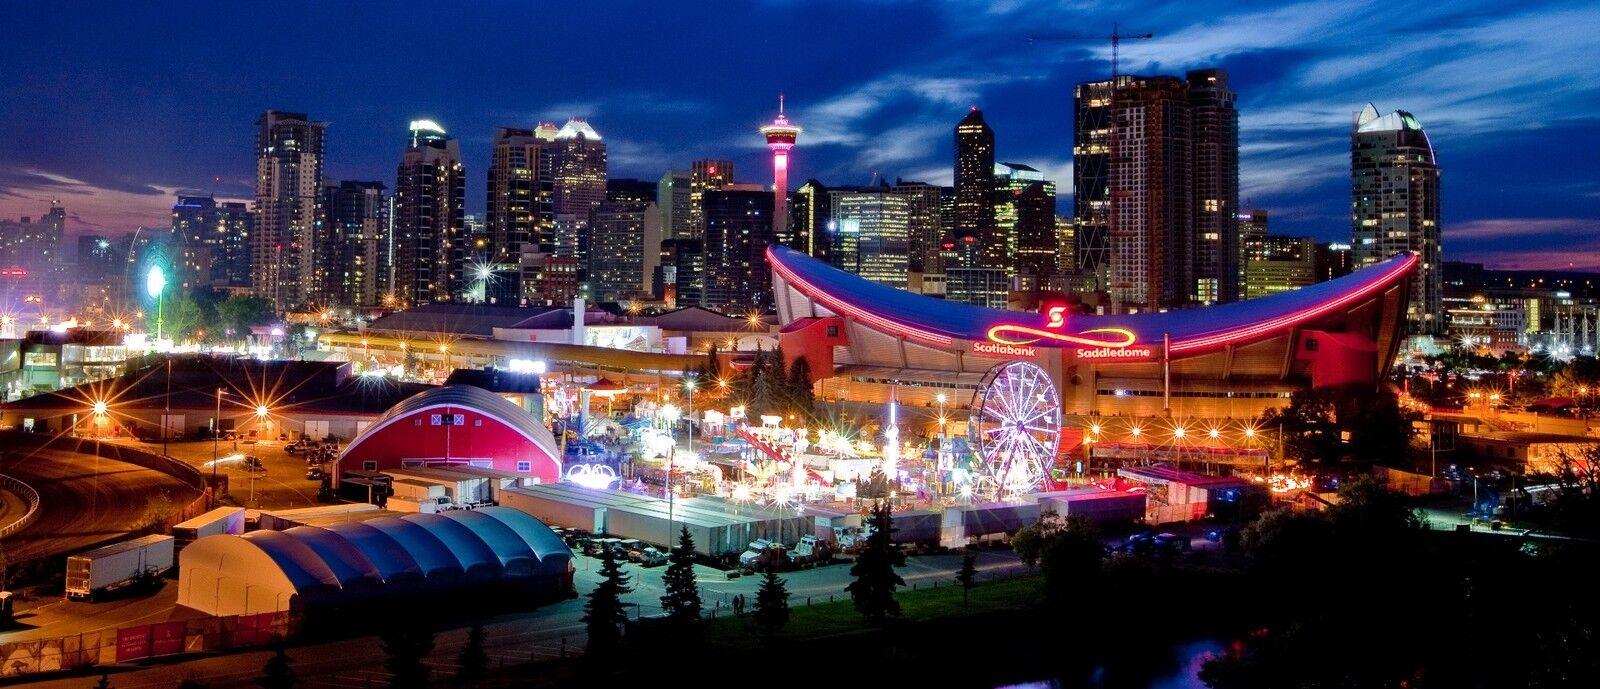 Calgary Stampede Rodeo 752019 Tickets  StubHub